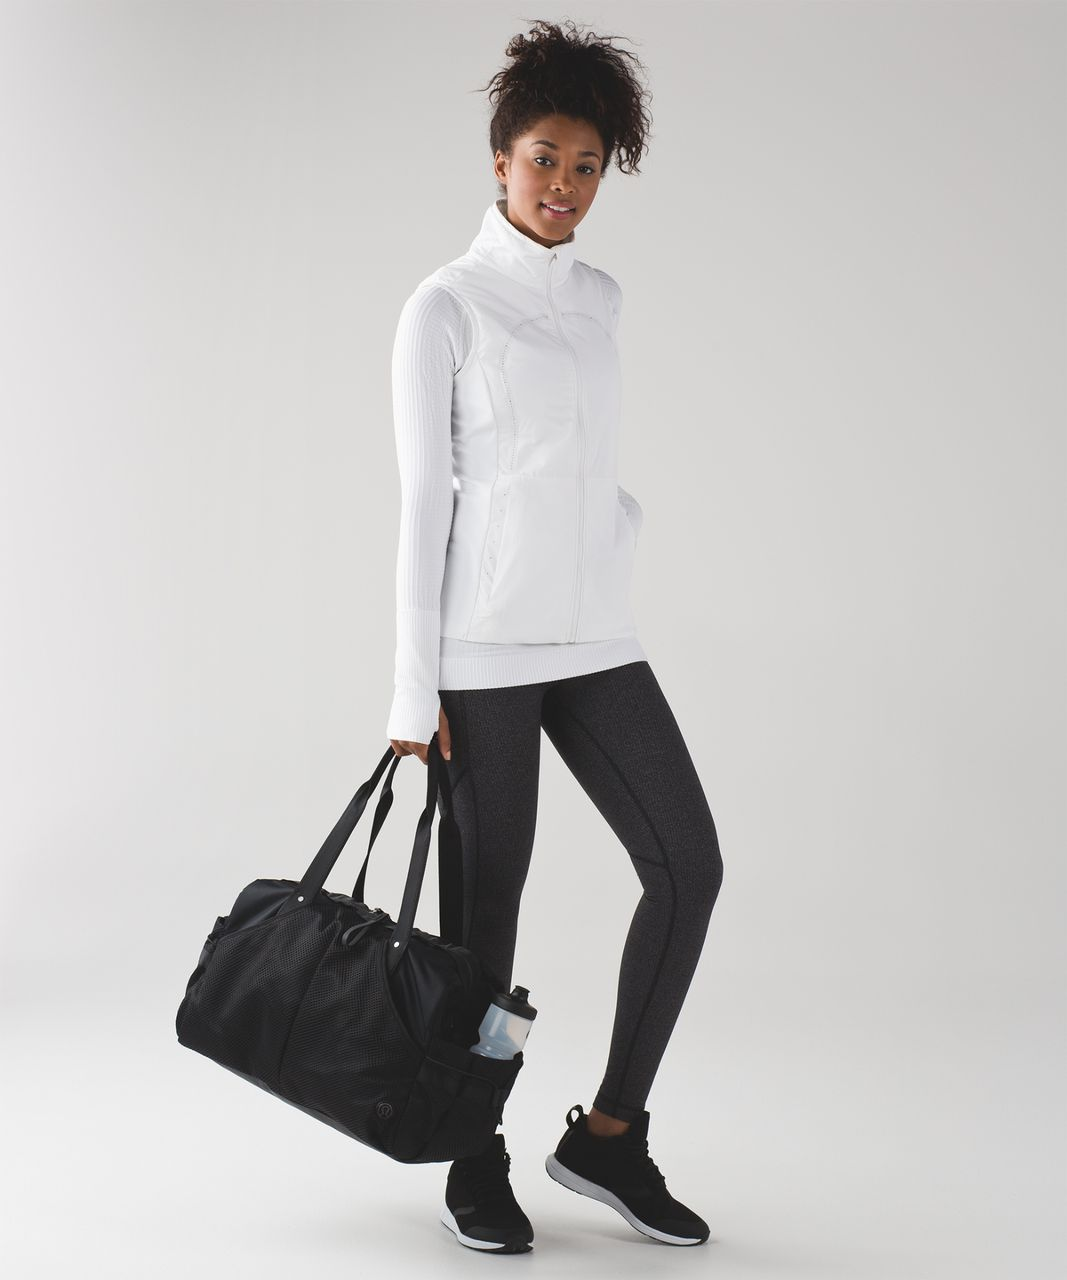 Lululemon Speed Tight V - Power Luxtreme Variegated Knit Black Heathered Black